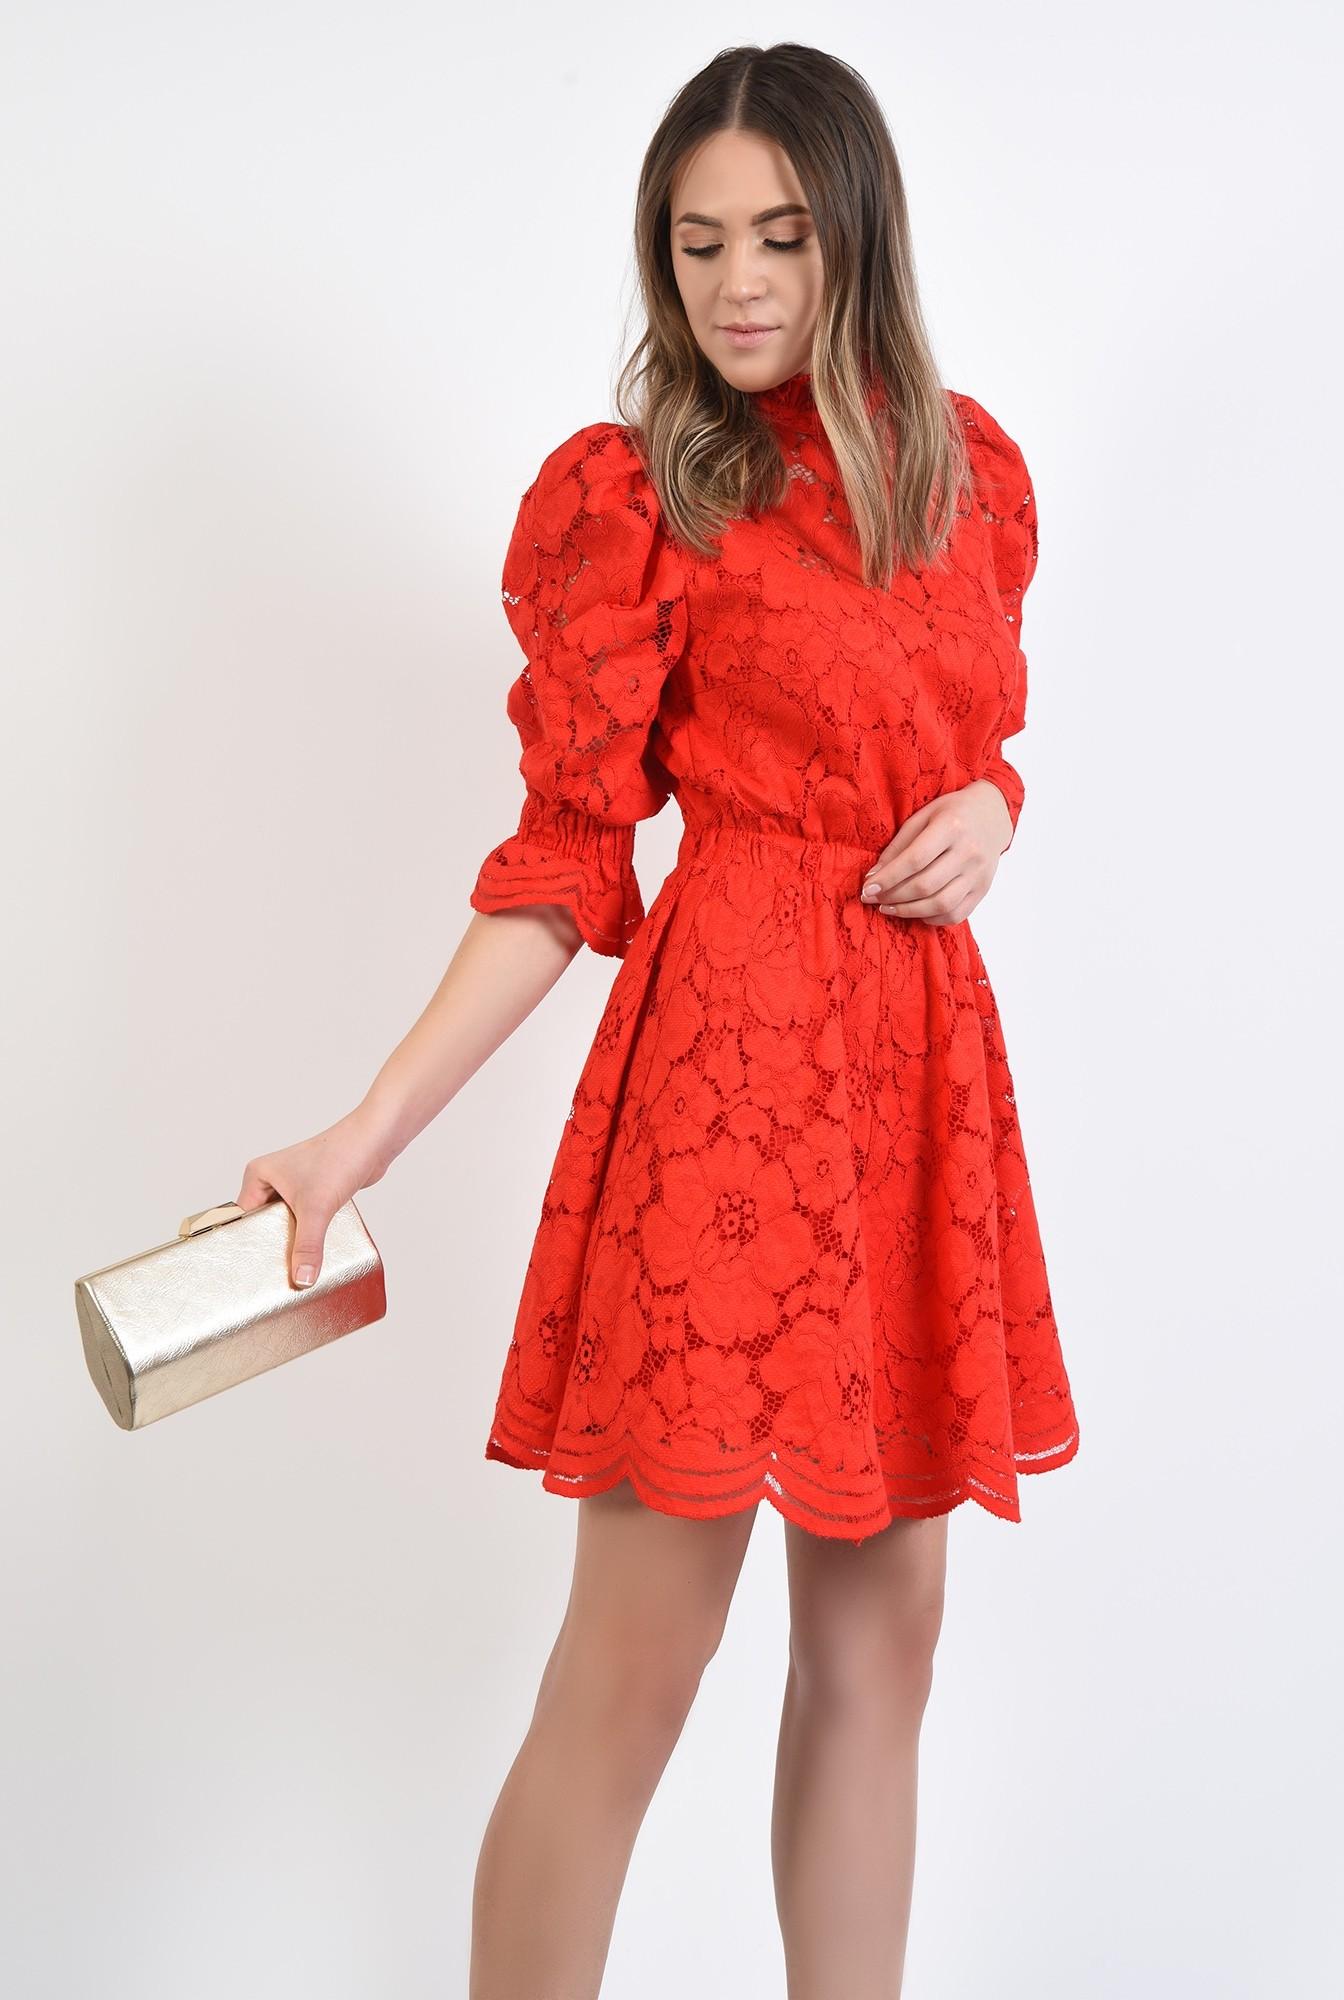 2 - 360 - rochie de ocazie, din dantela, rosie, clos, scurta